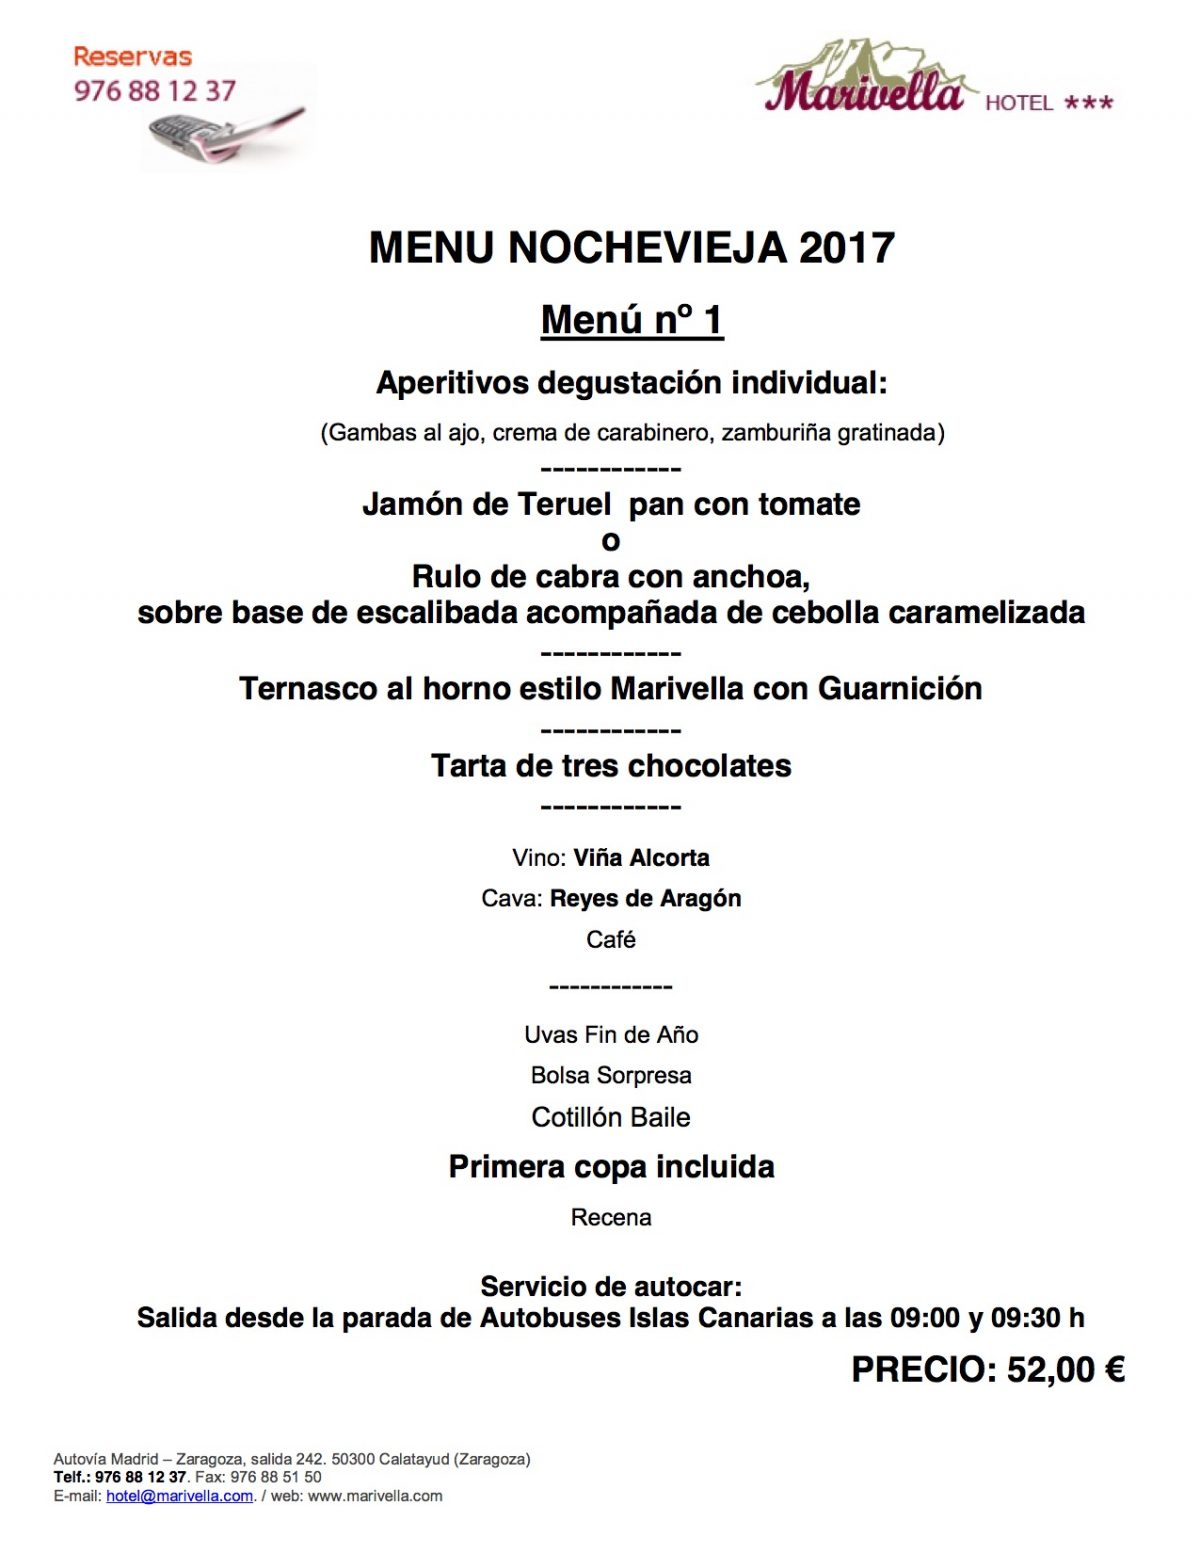 2017-MENU-NOCHEVIEJA-1200x1553.jpg